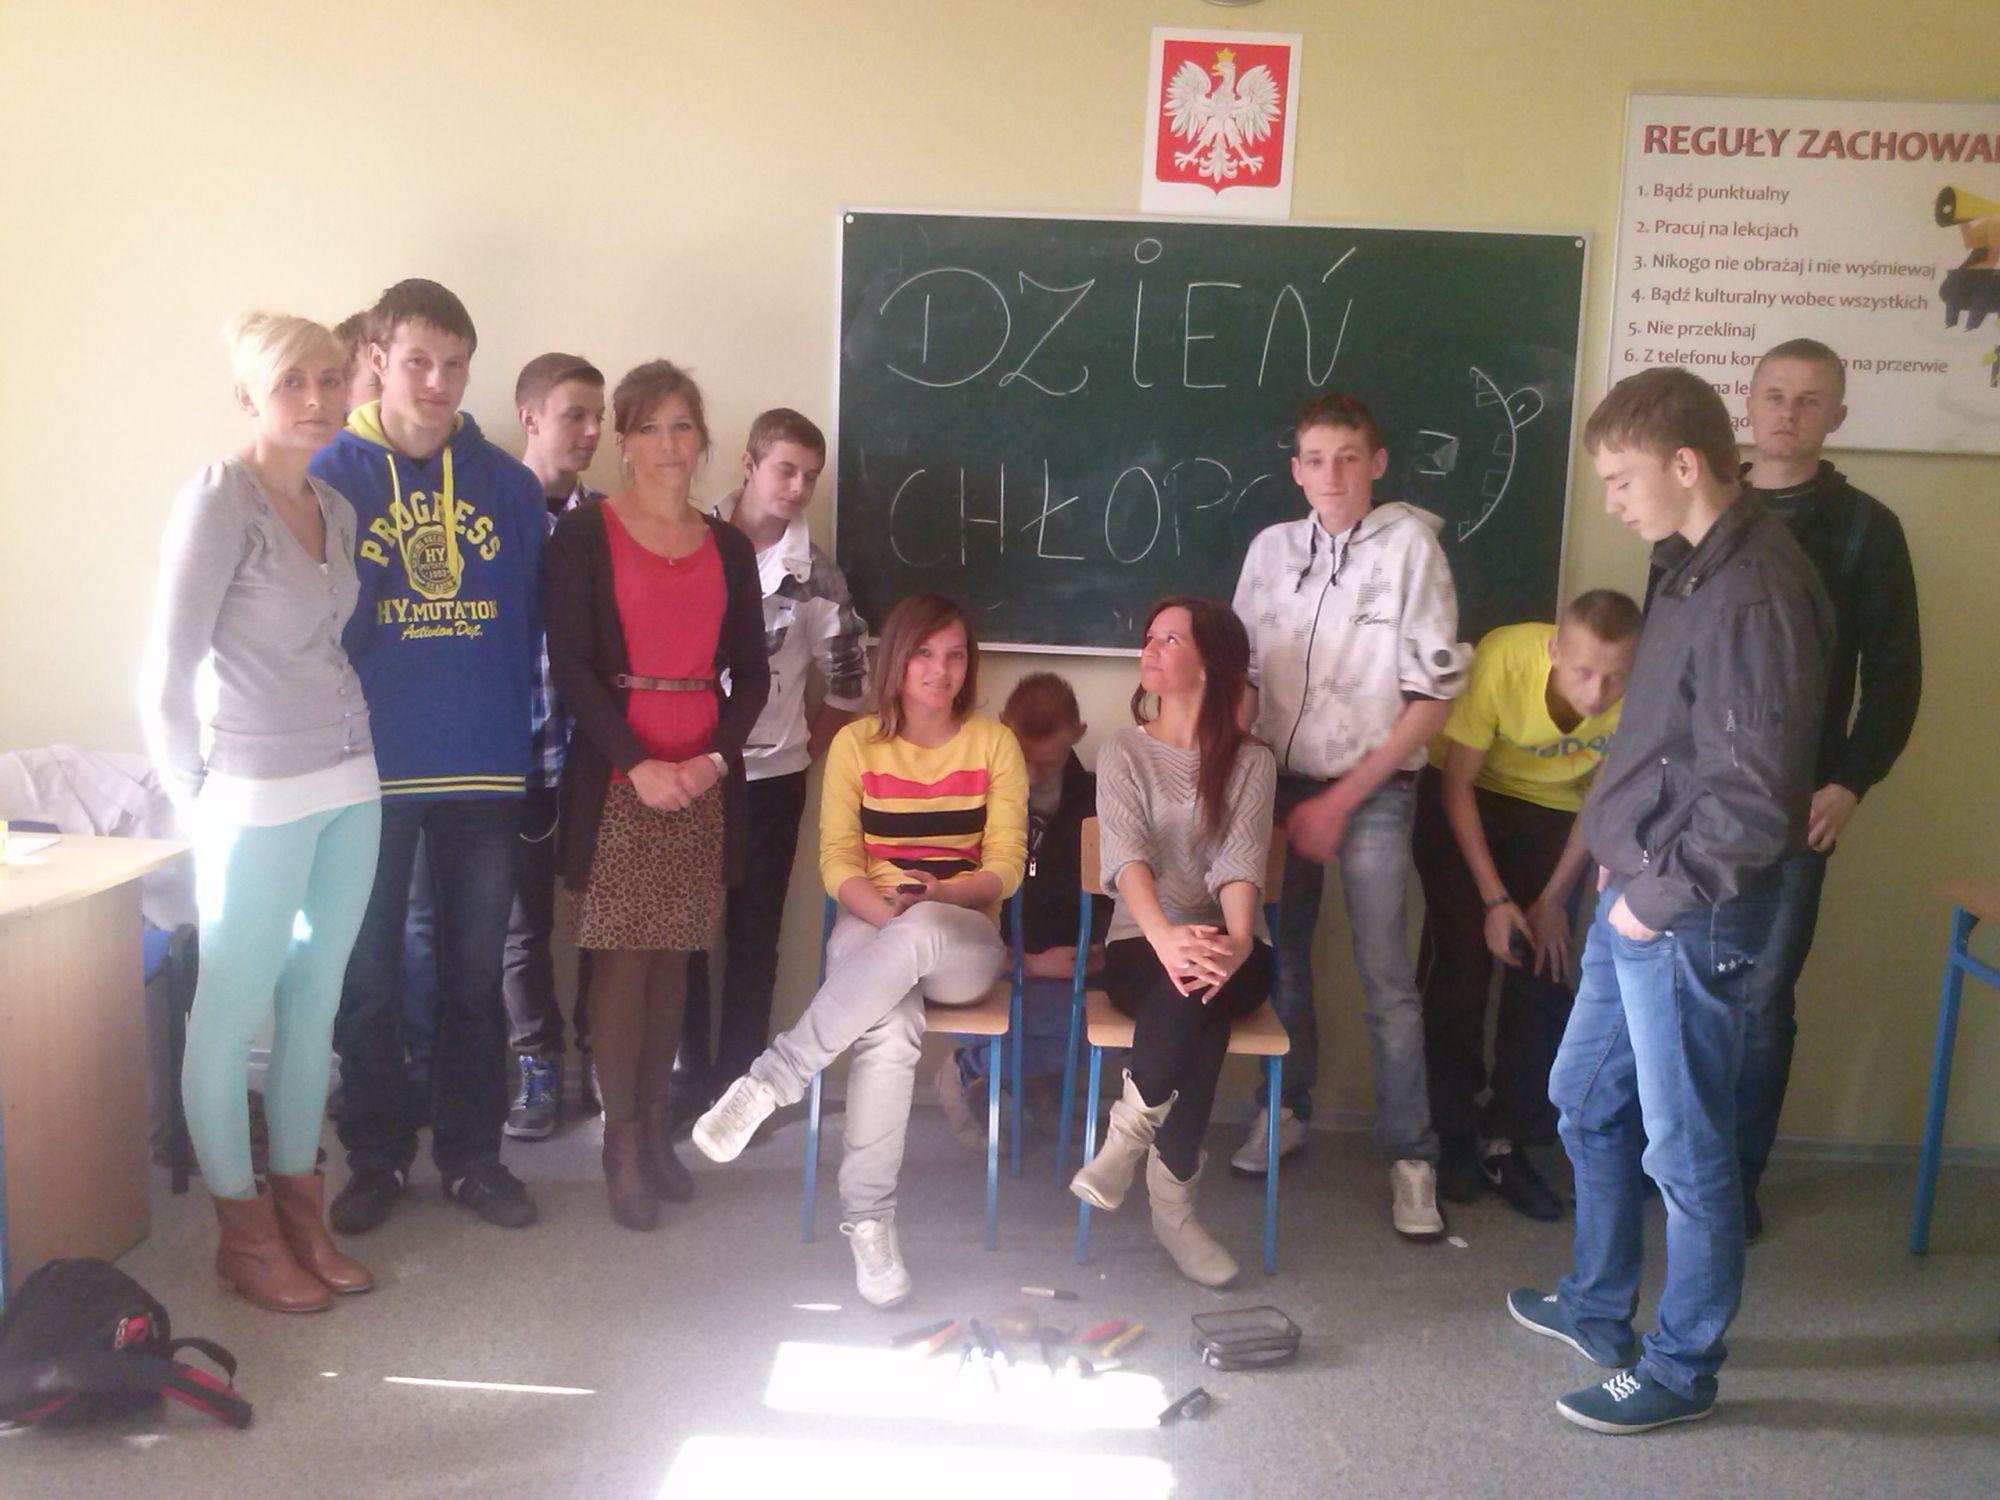 Dzien_chlopca